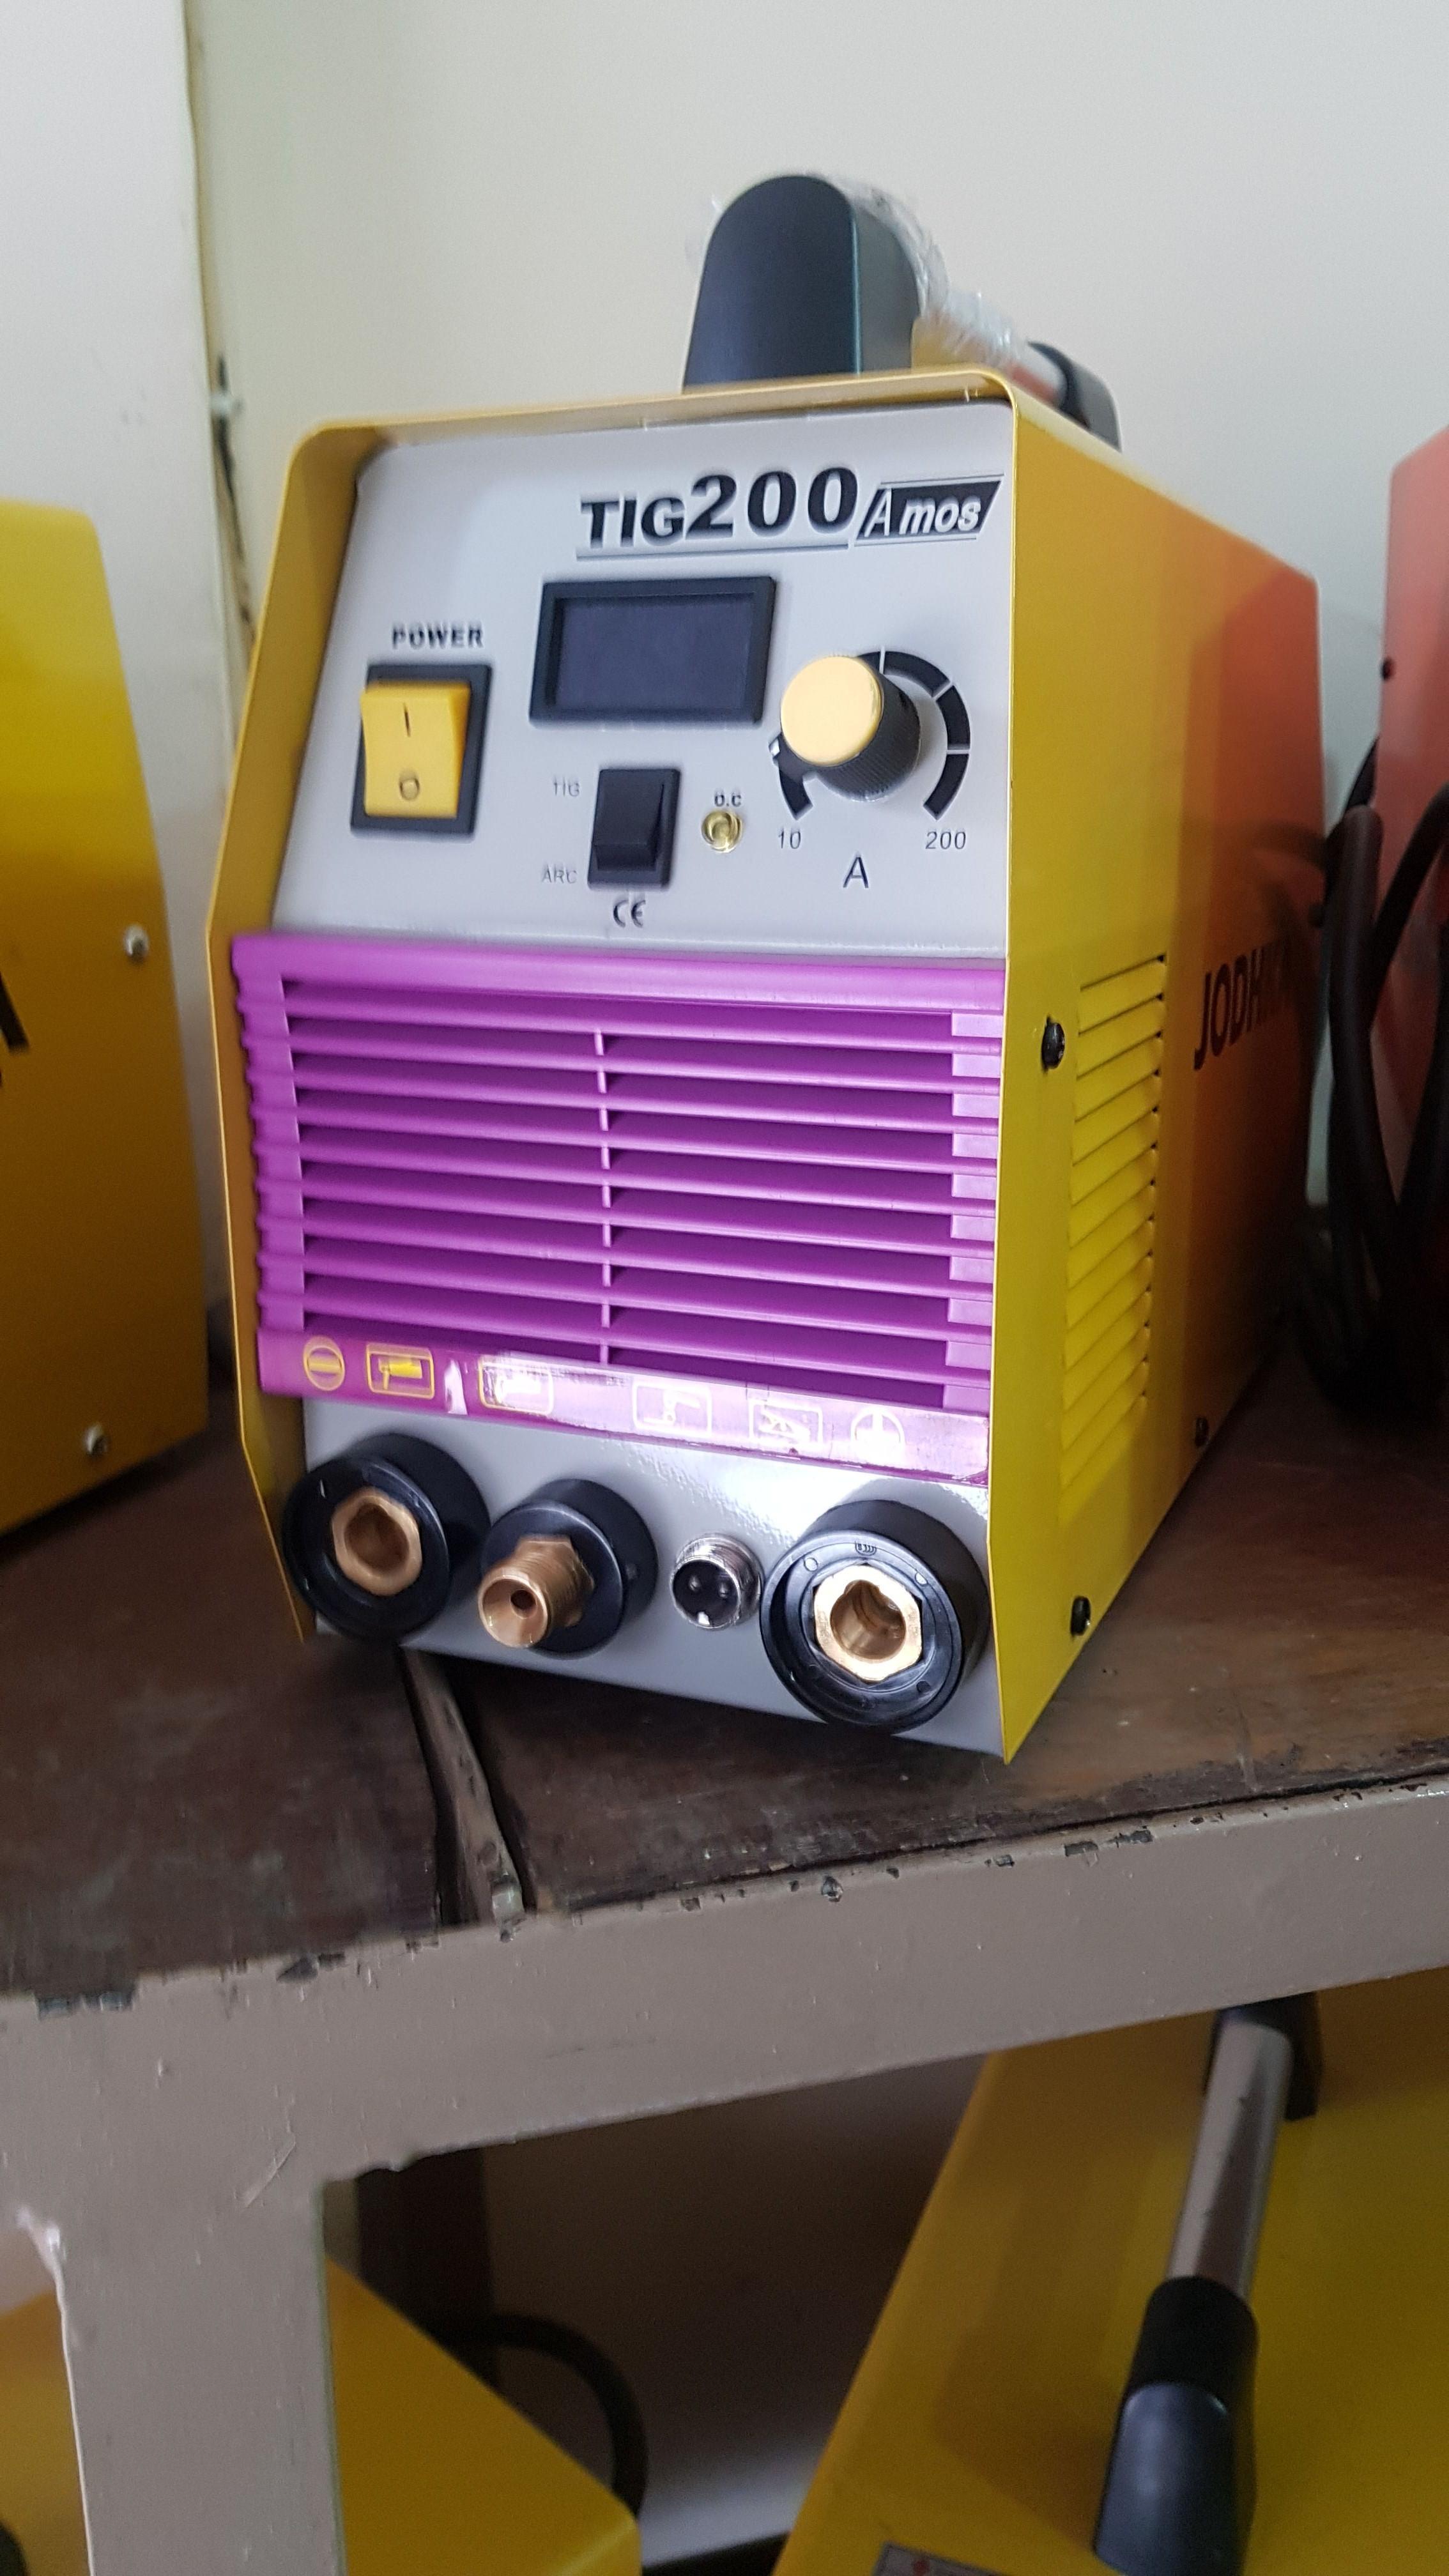 200 Amp 1 phase ARC/TIG